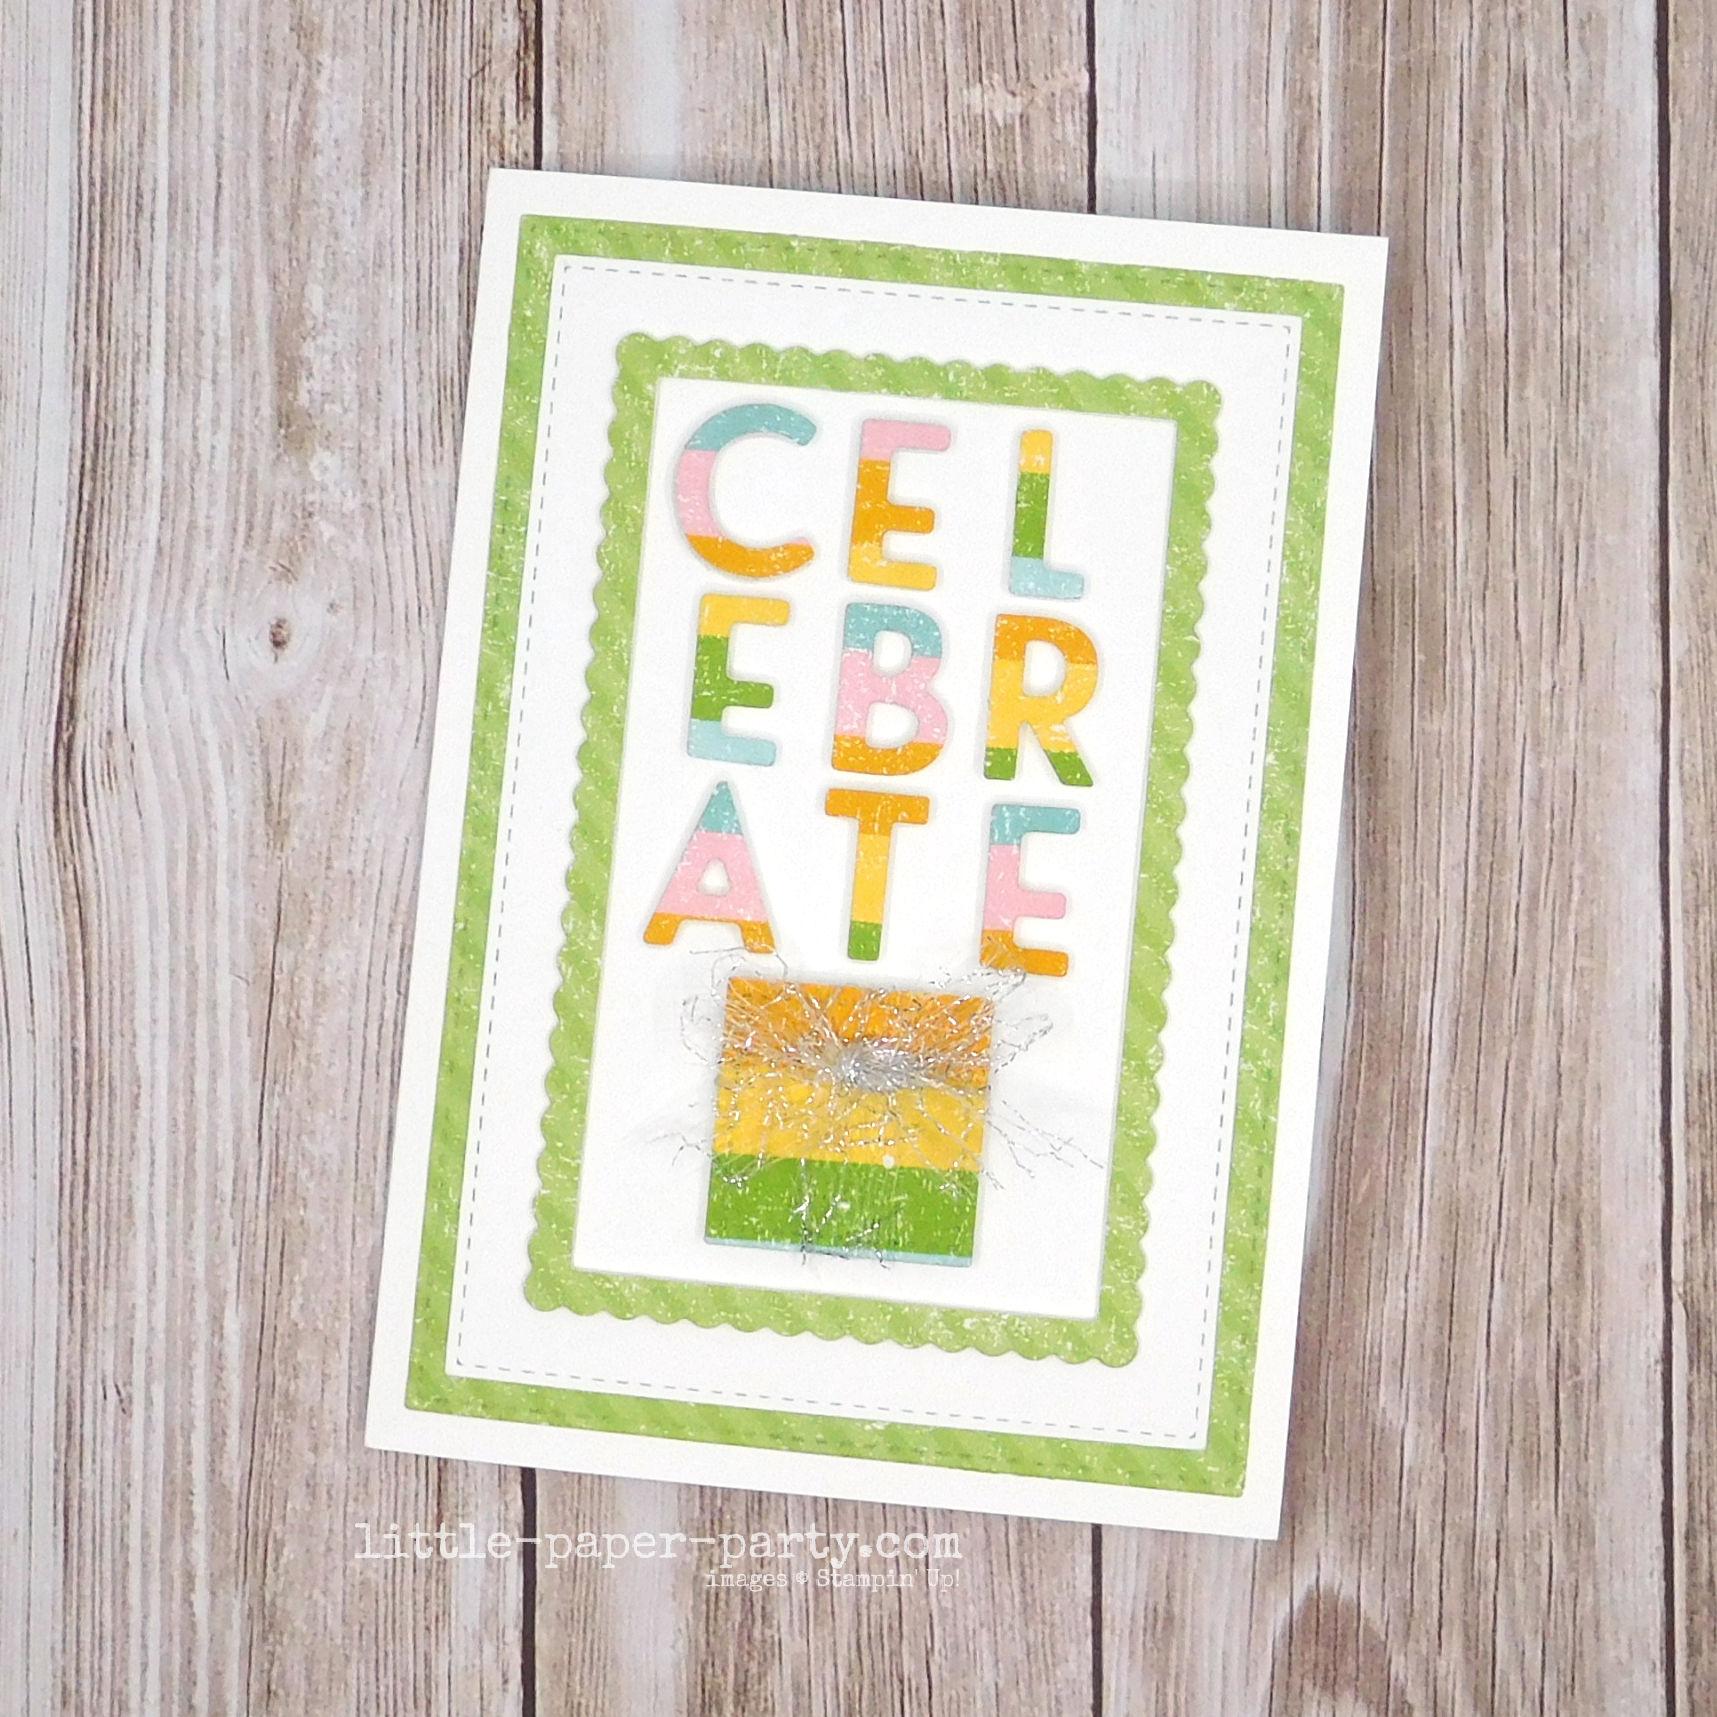 Little Paper Party, Playful Alphabet, Stitched Shapes Dies, 1